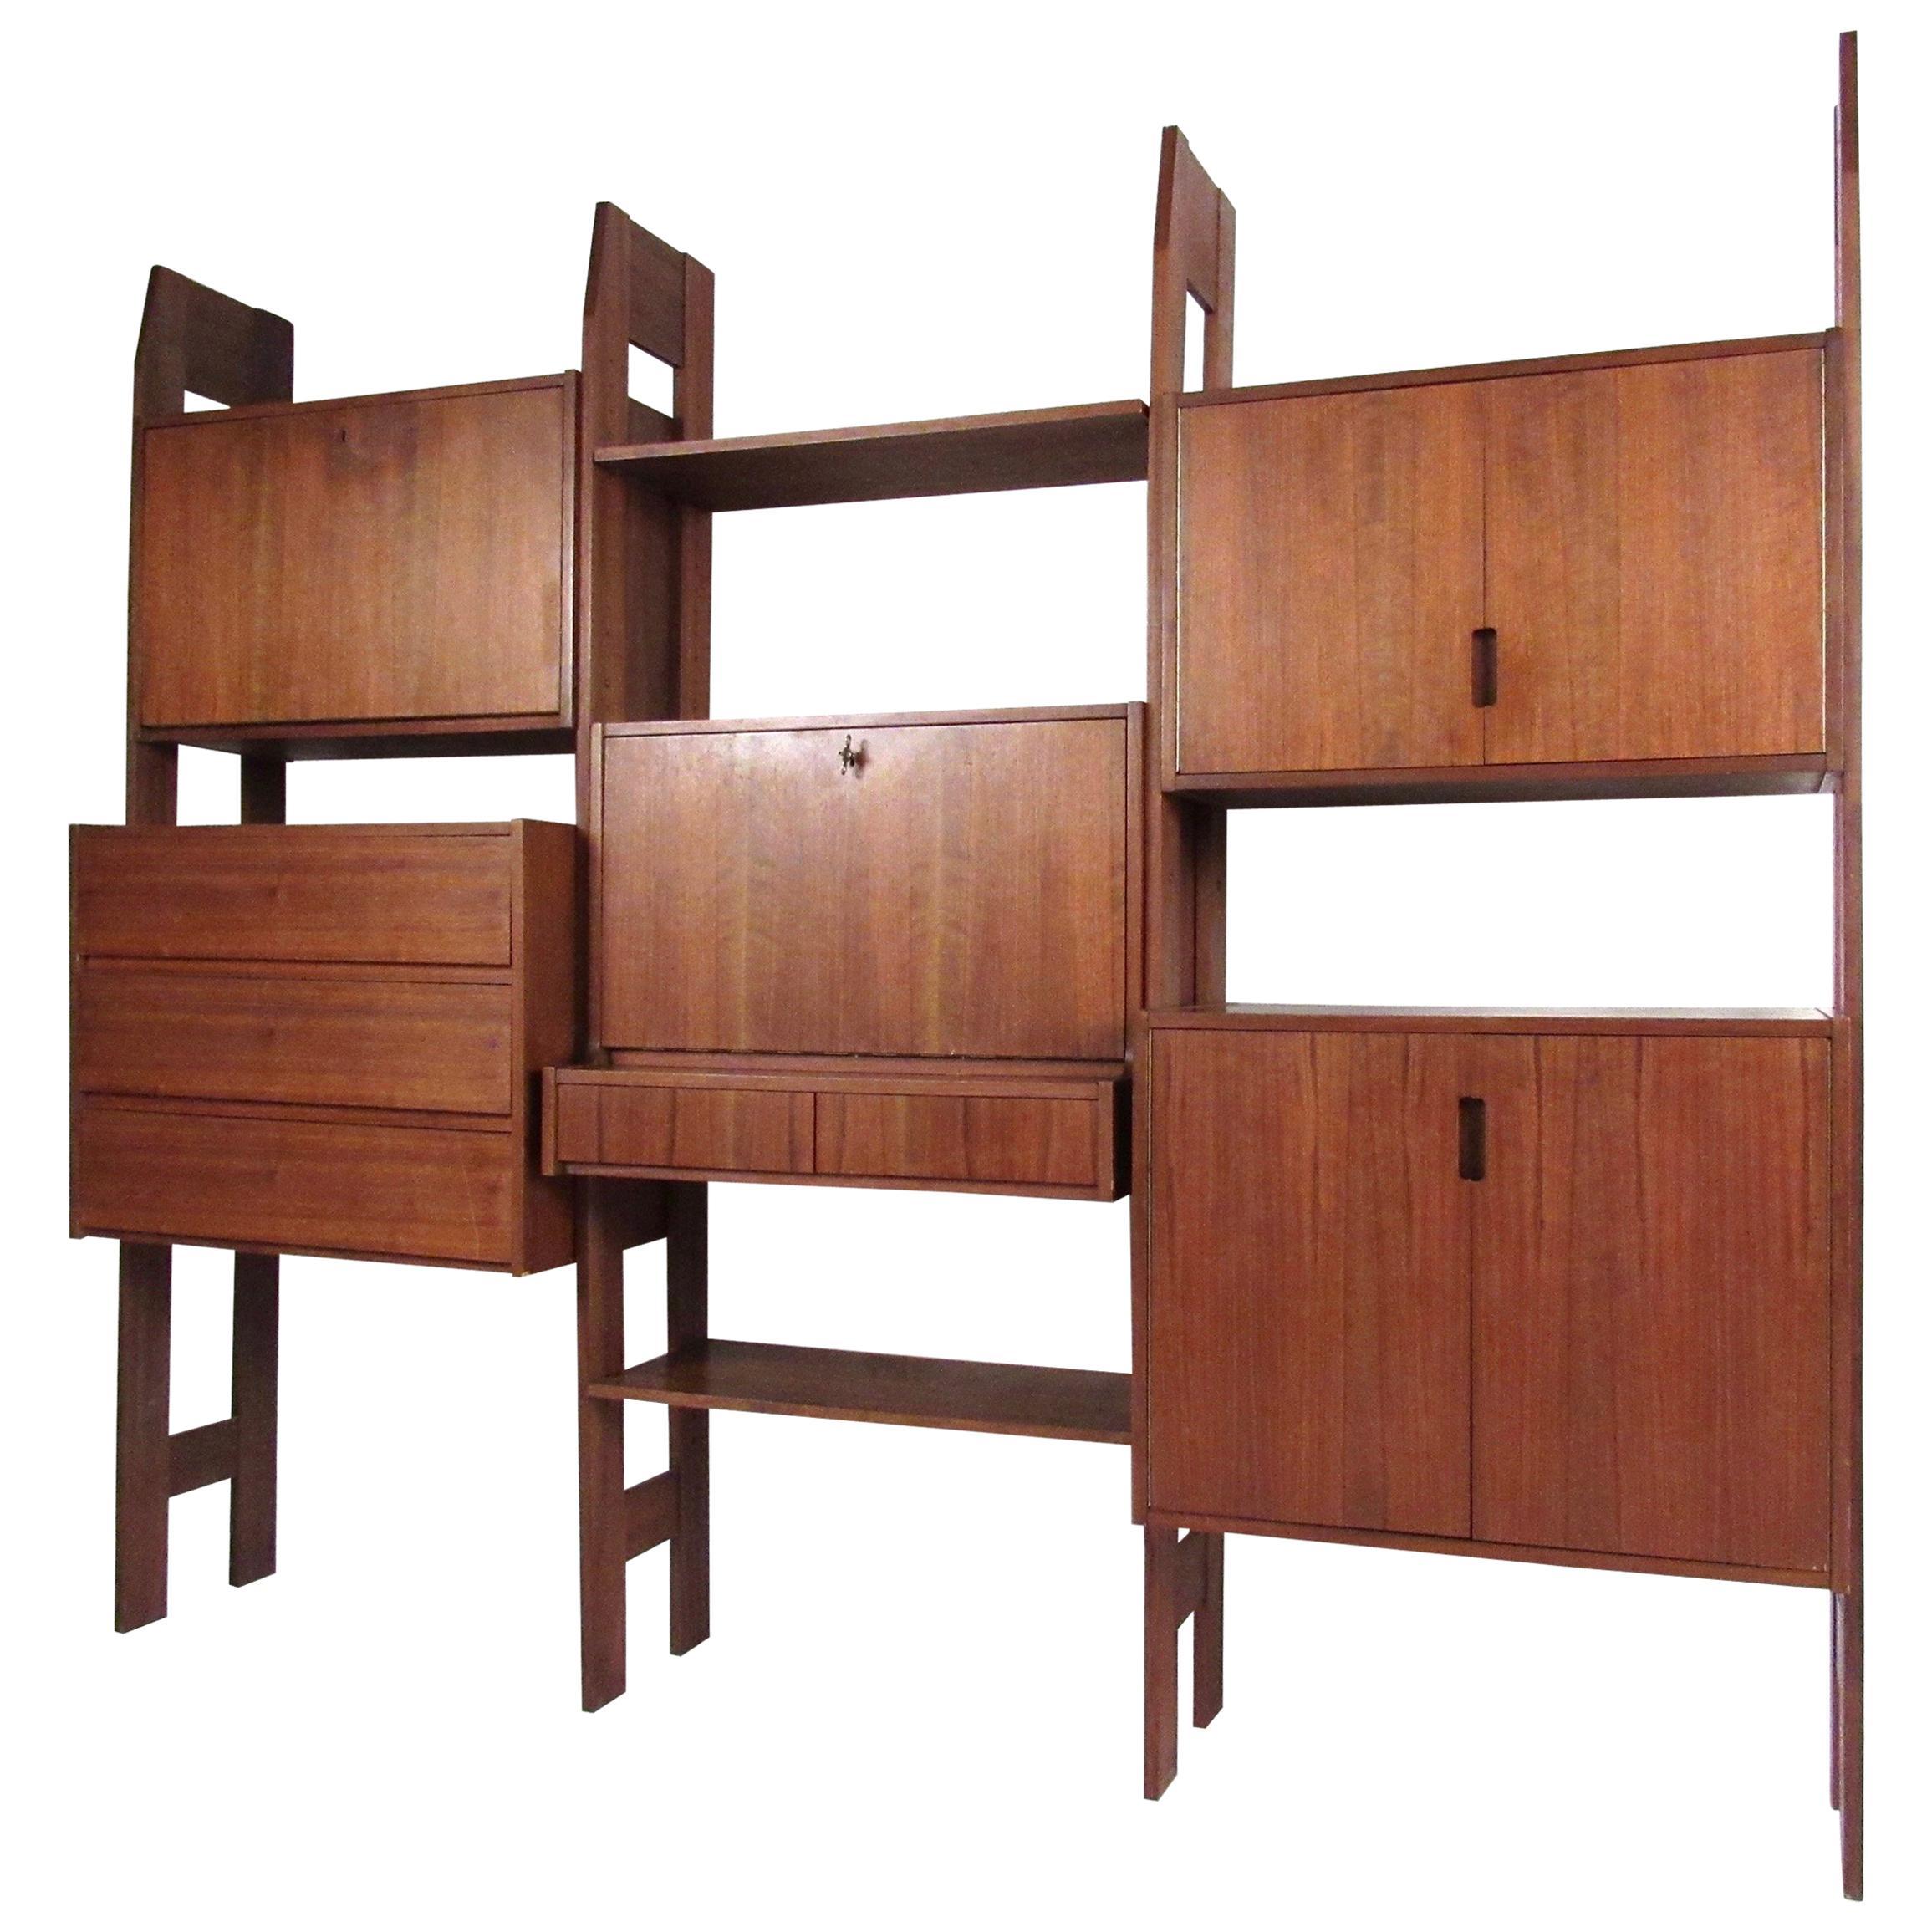 Mid-Century Modern Teak Wall Unit or Bookshelf